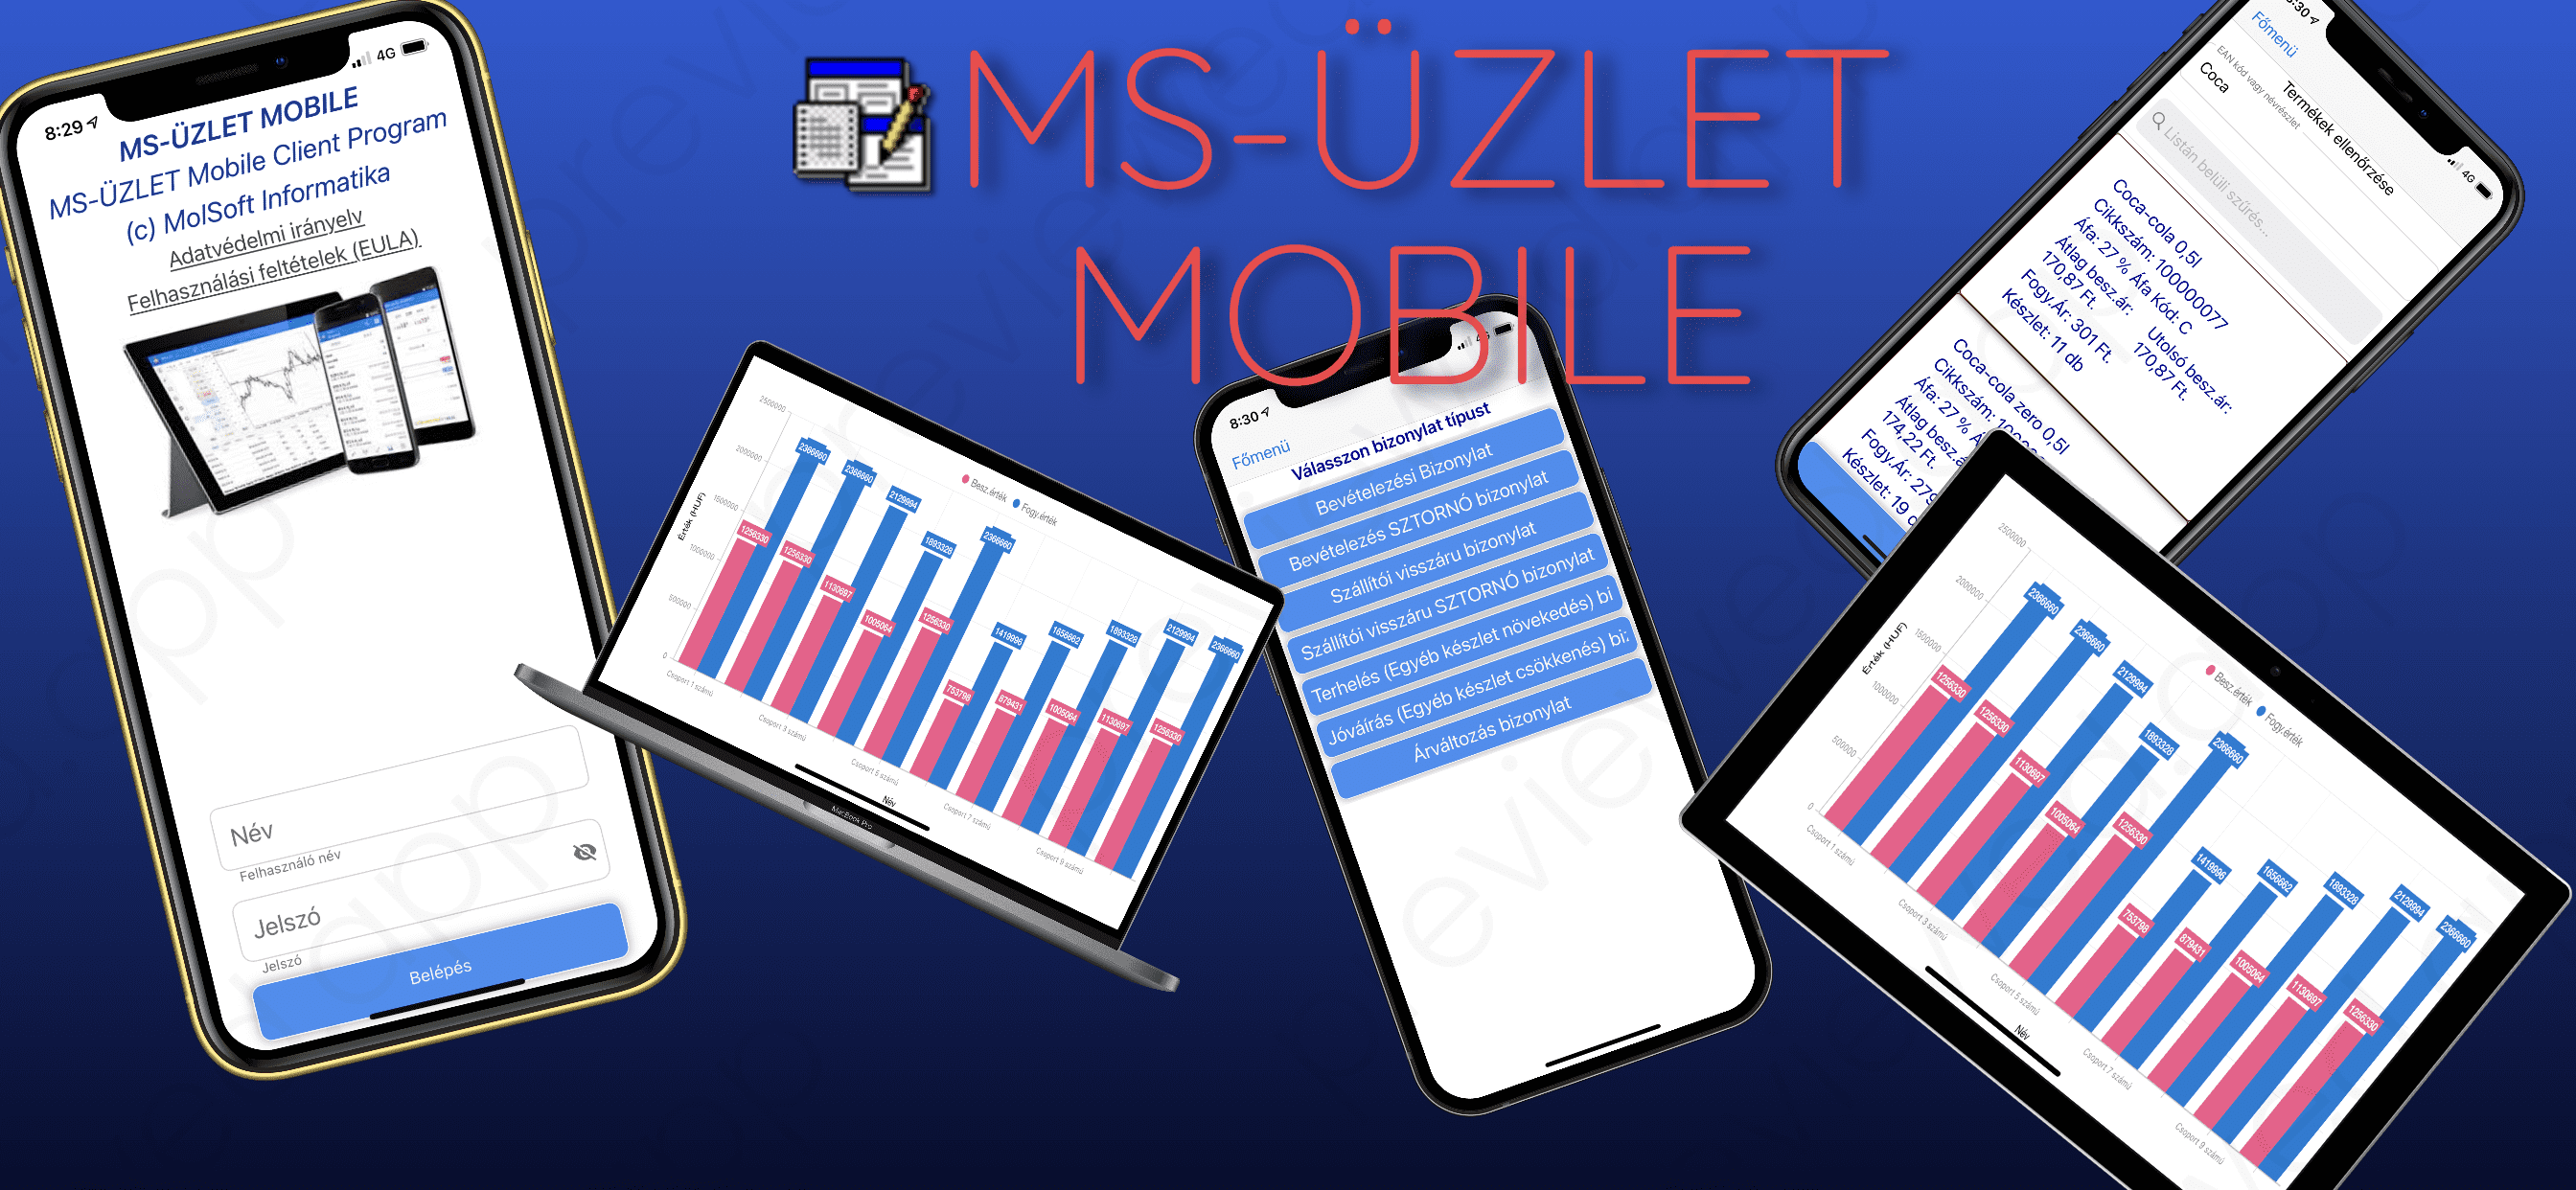 MS-ÜZLET mobil